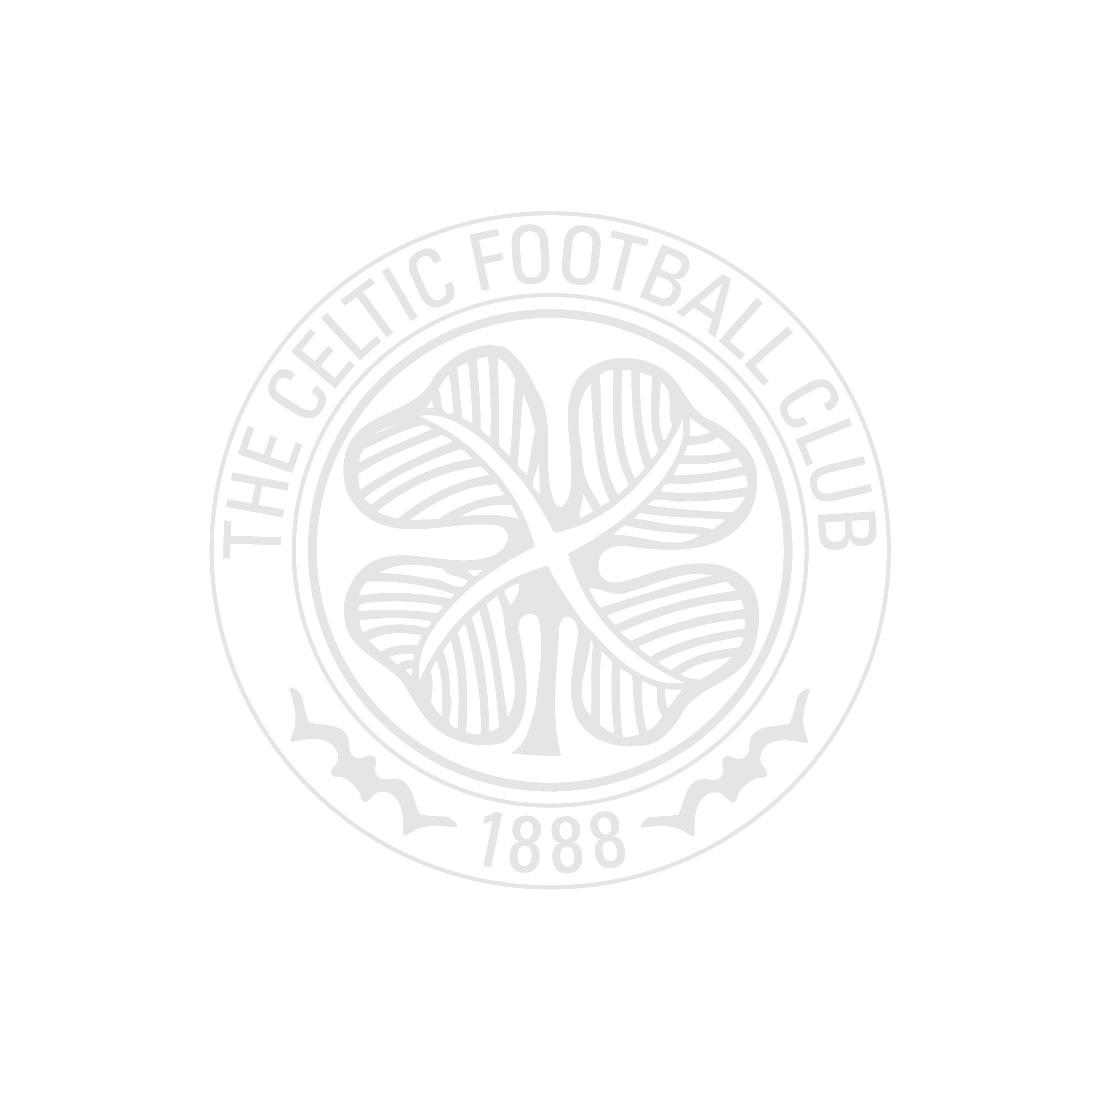 Celtic Seville Fans Print